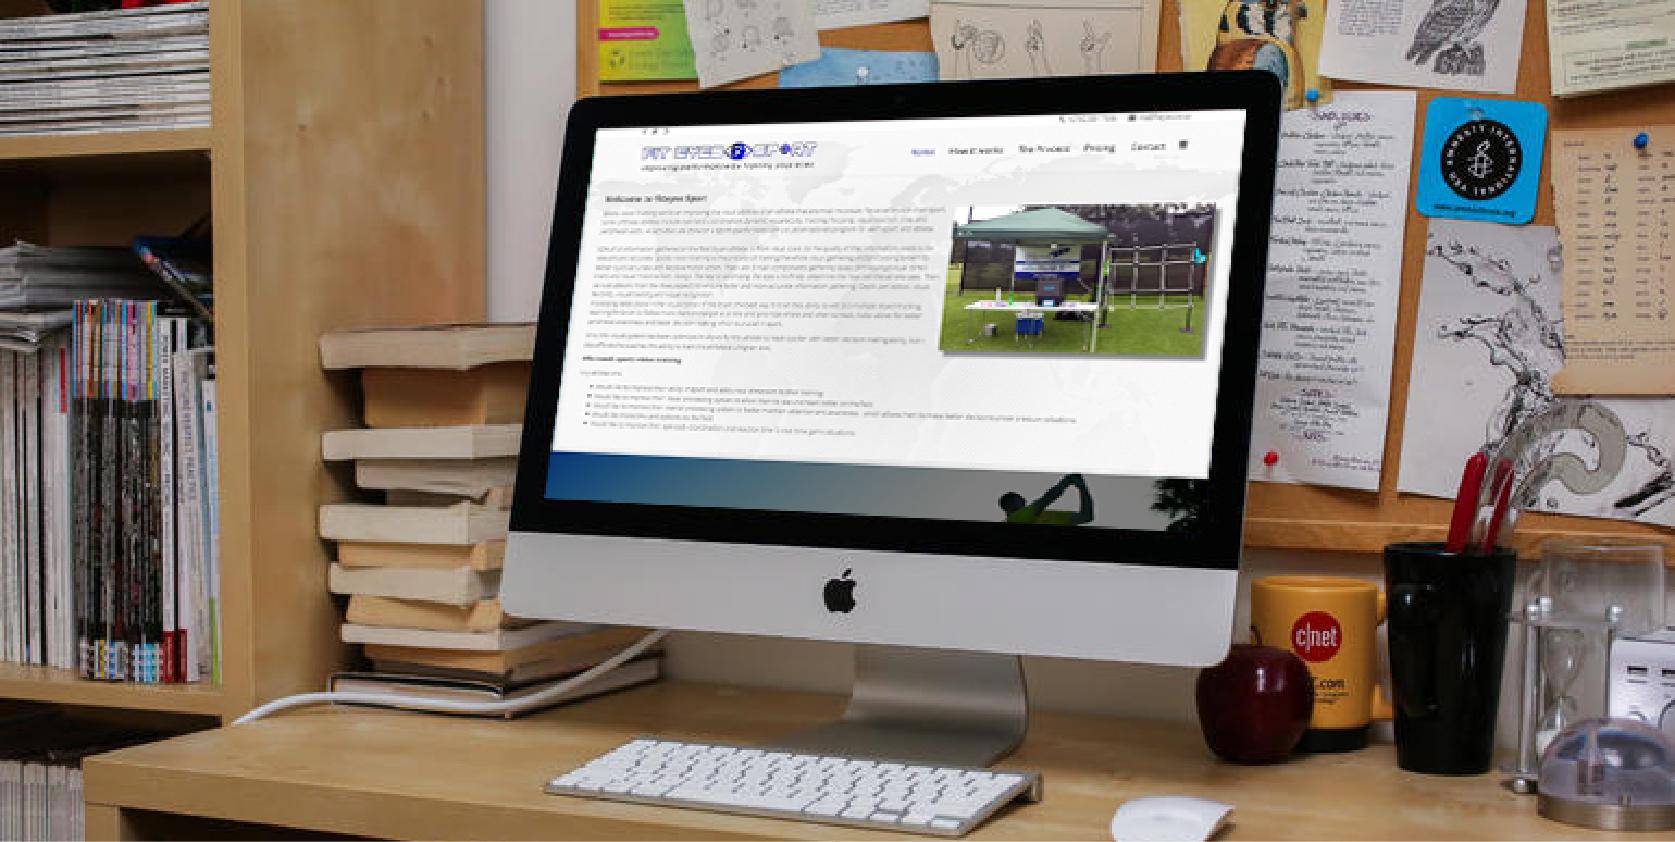 Fiteyes website design by Living Graphix design and digital marketing agency